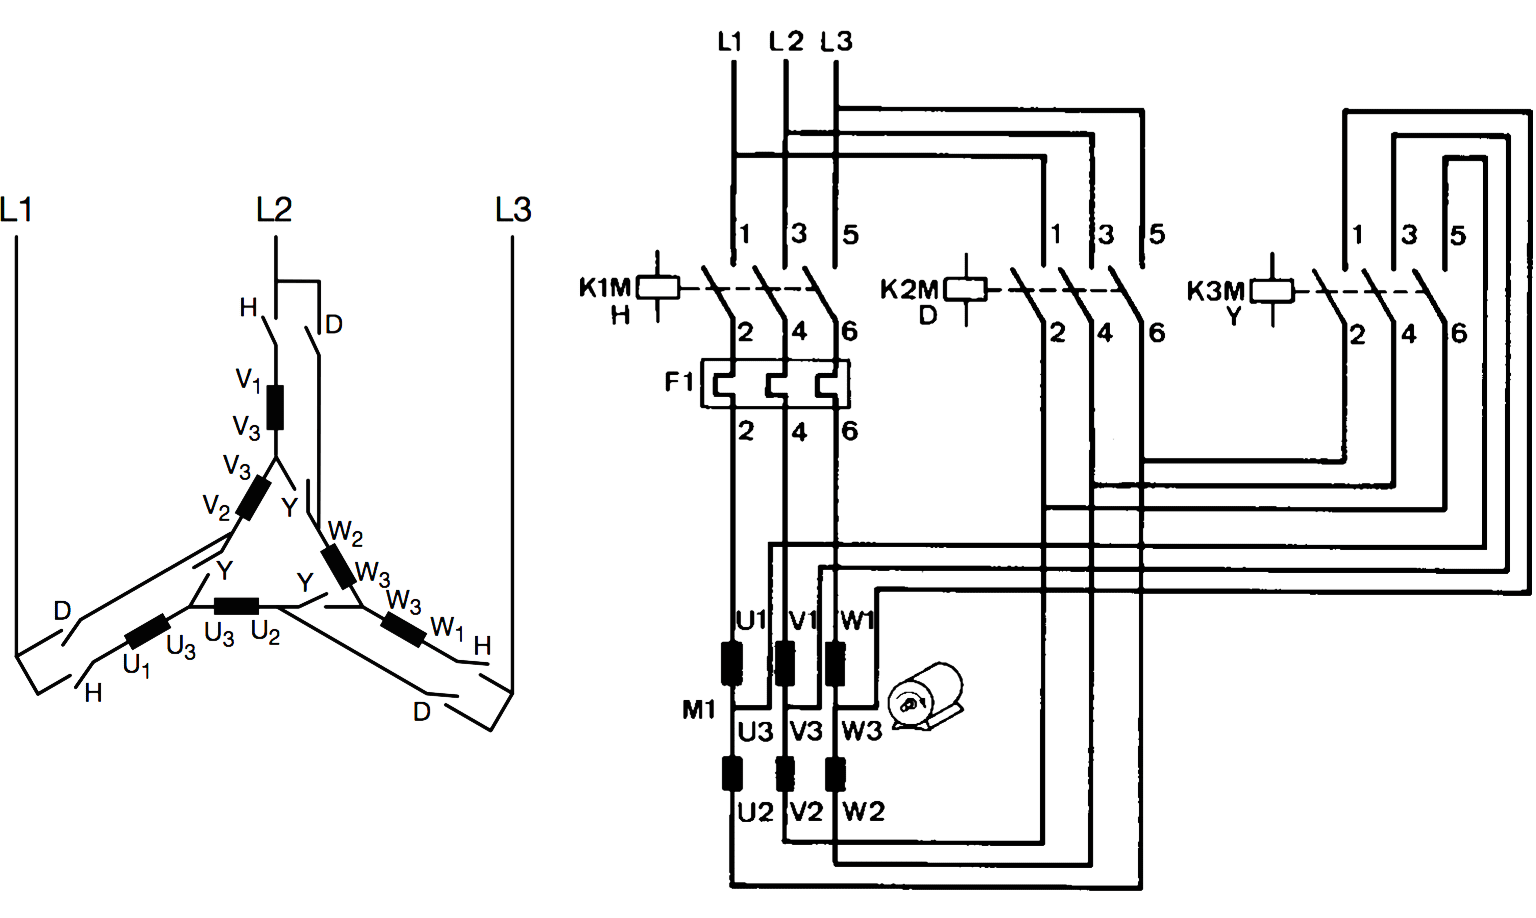 method of wiring